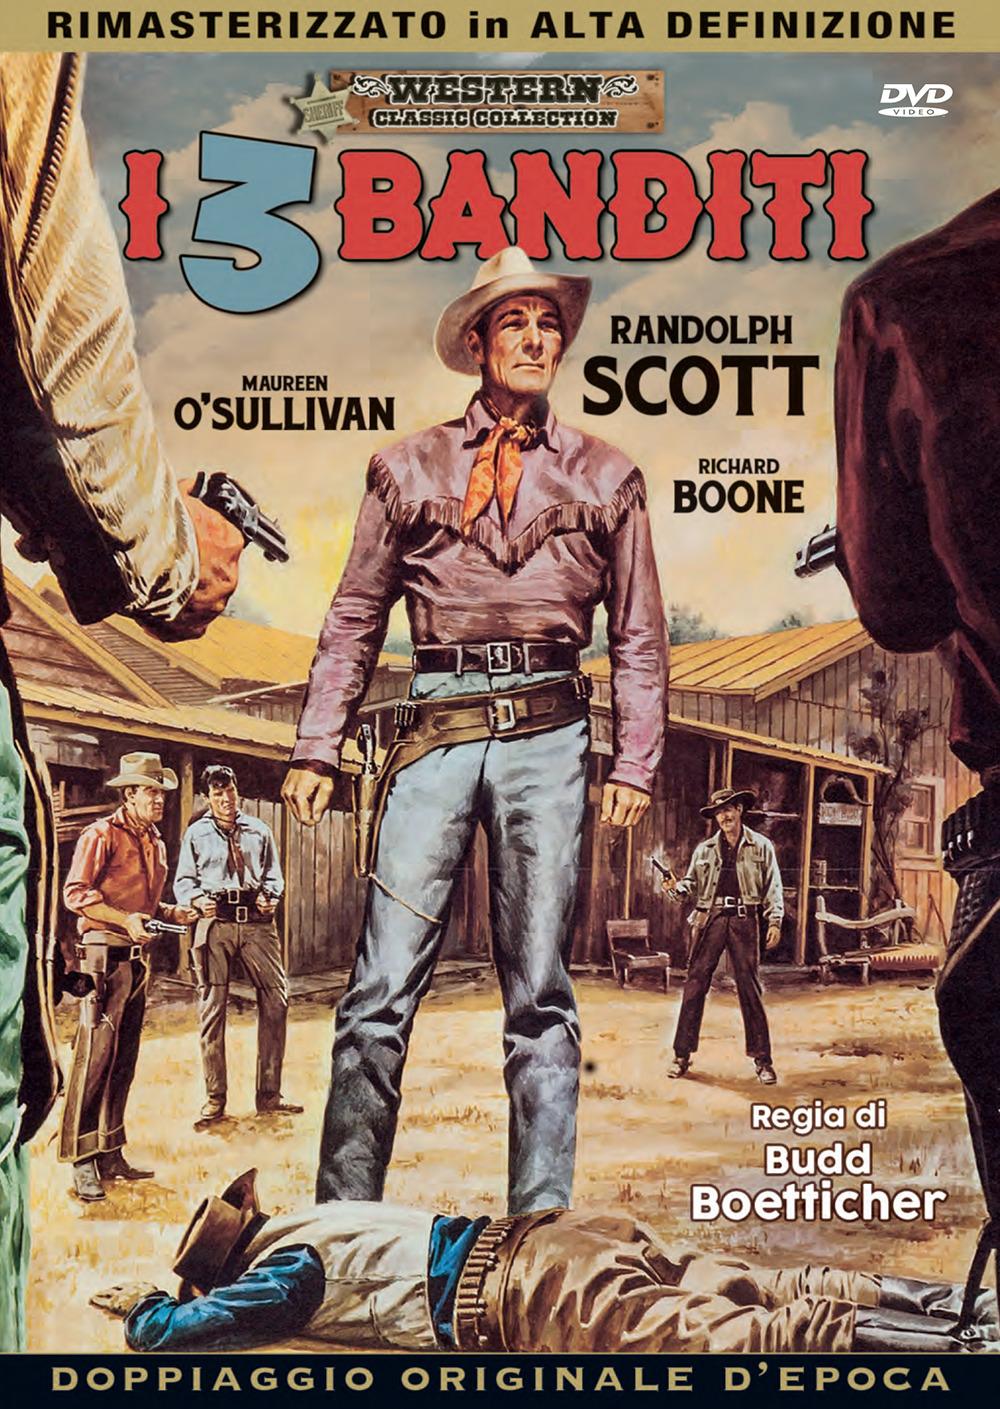 I TRE BANDITI (DVD)